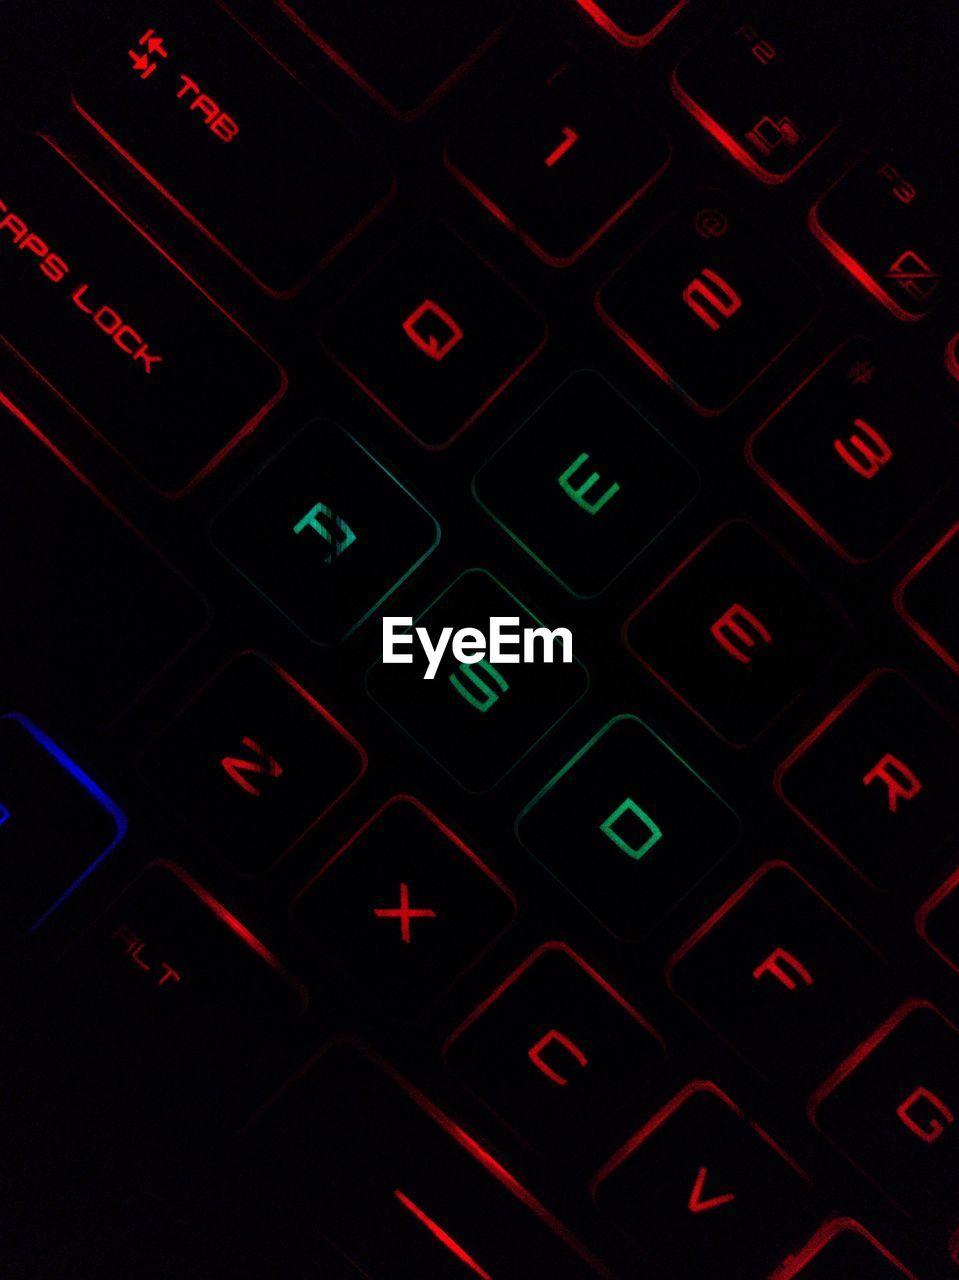 FULL FRAME SHOT OF ILLUMINATED TEXT ON COMPUTER KEYBOARD